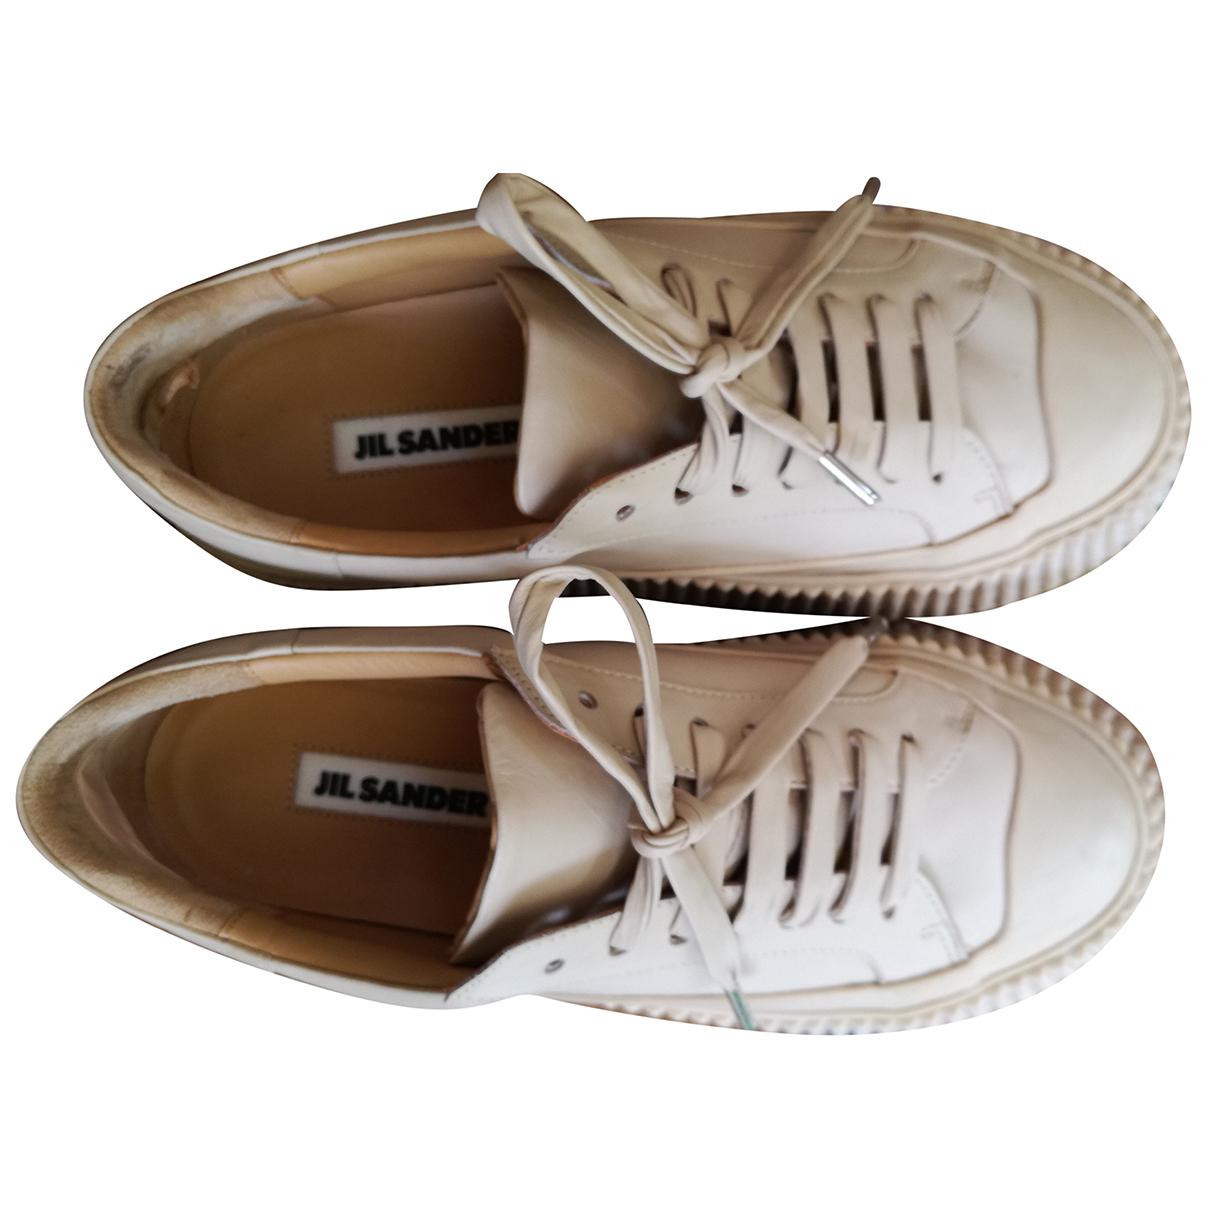 Jil Sander - Baskets   pour femme en cuir - beige